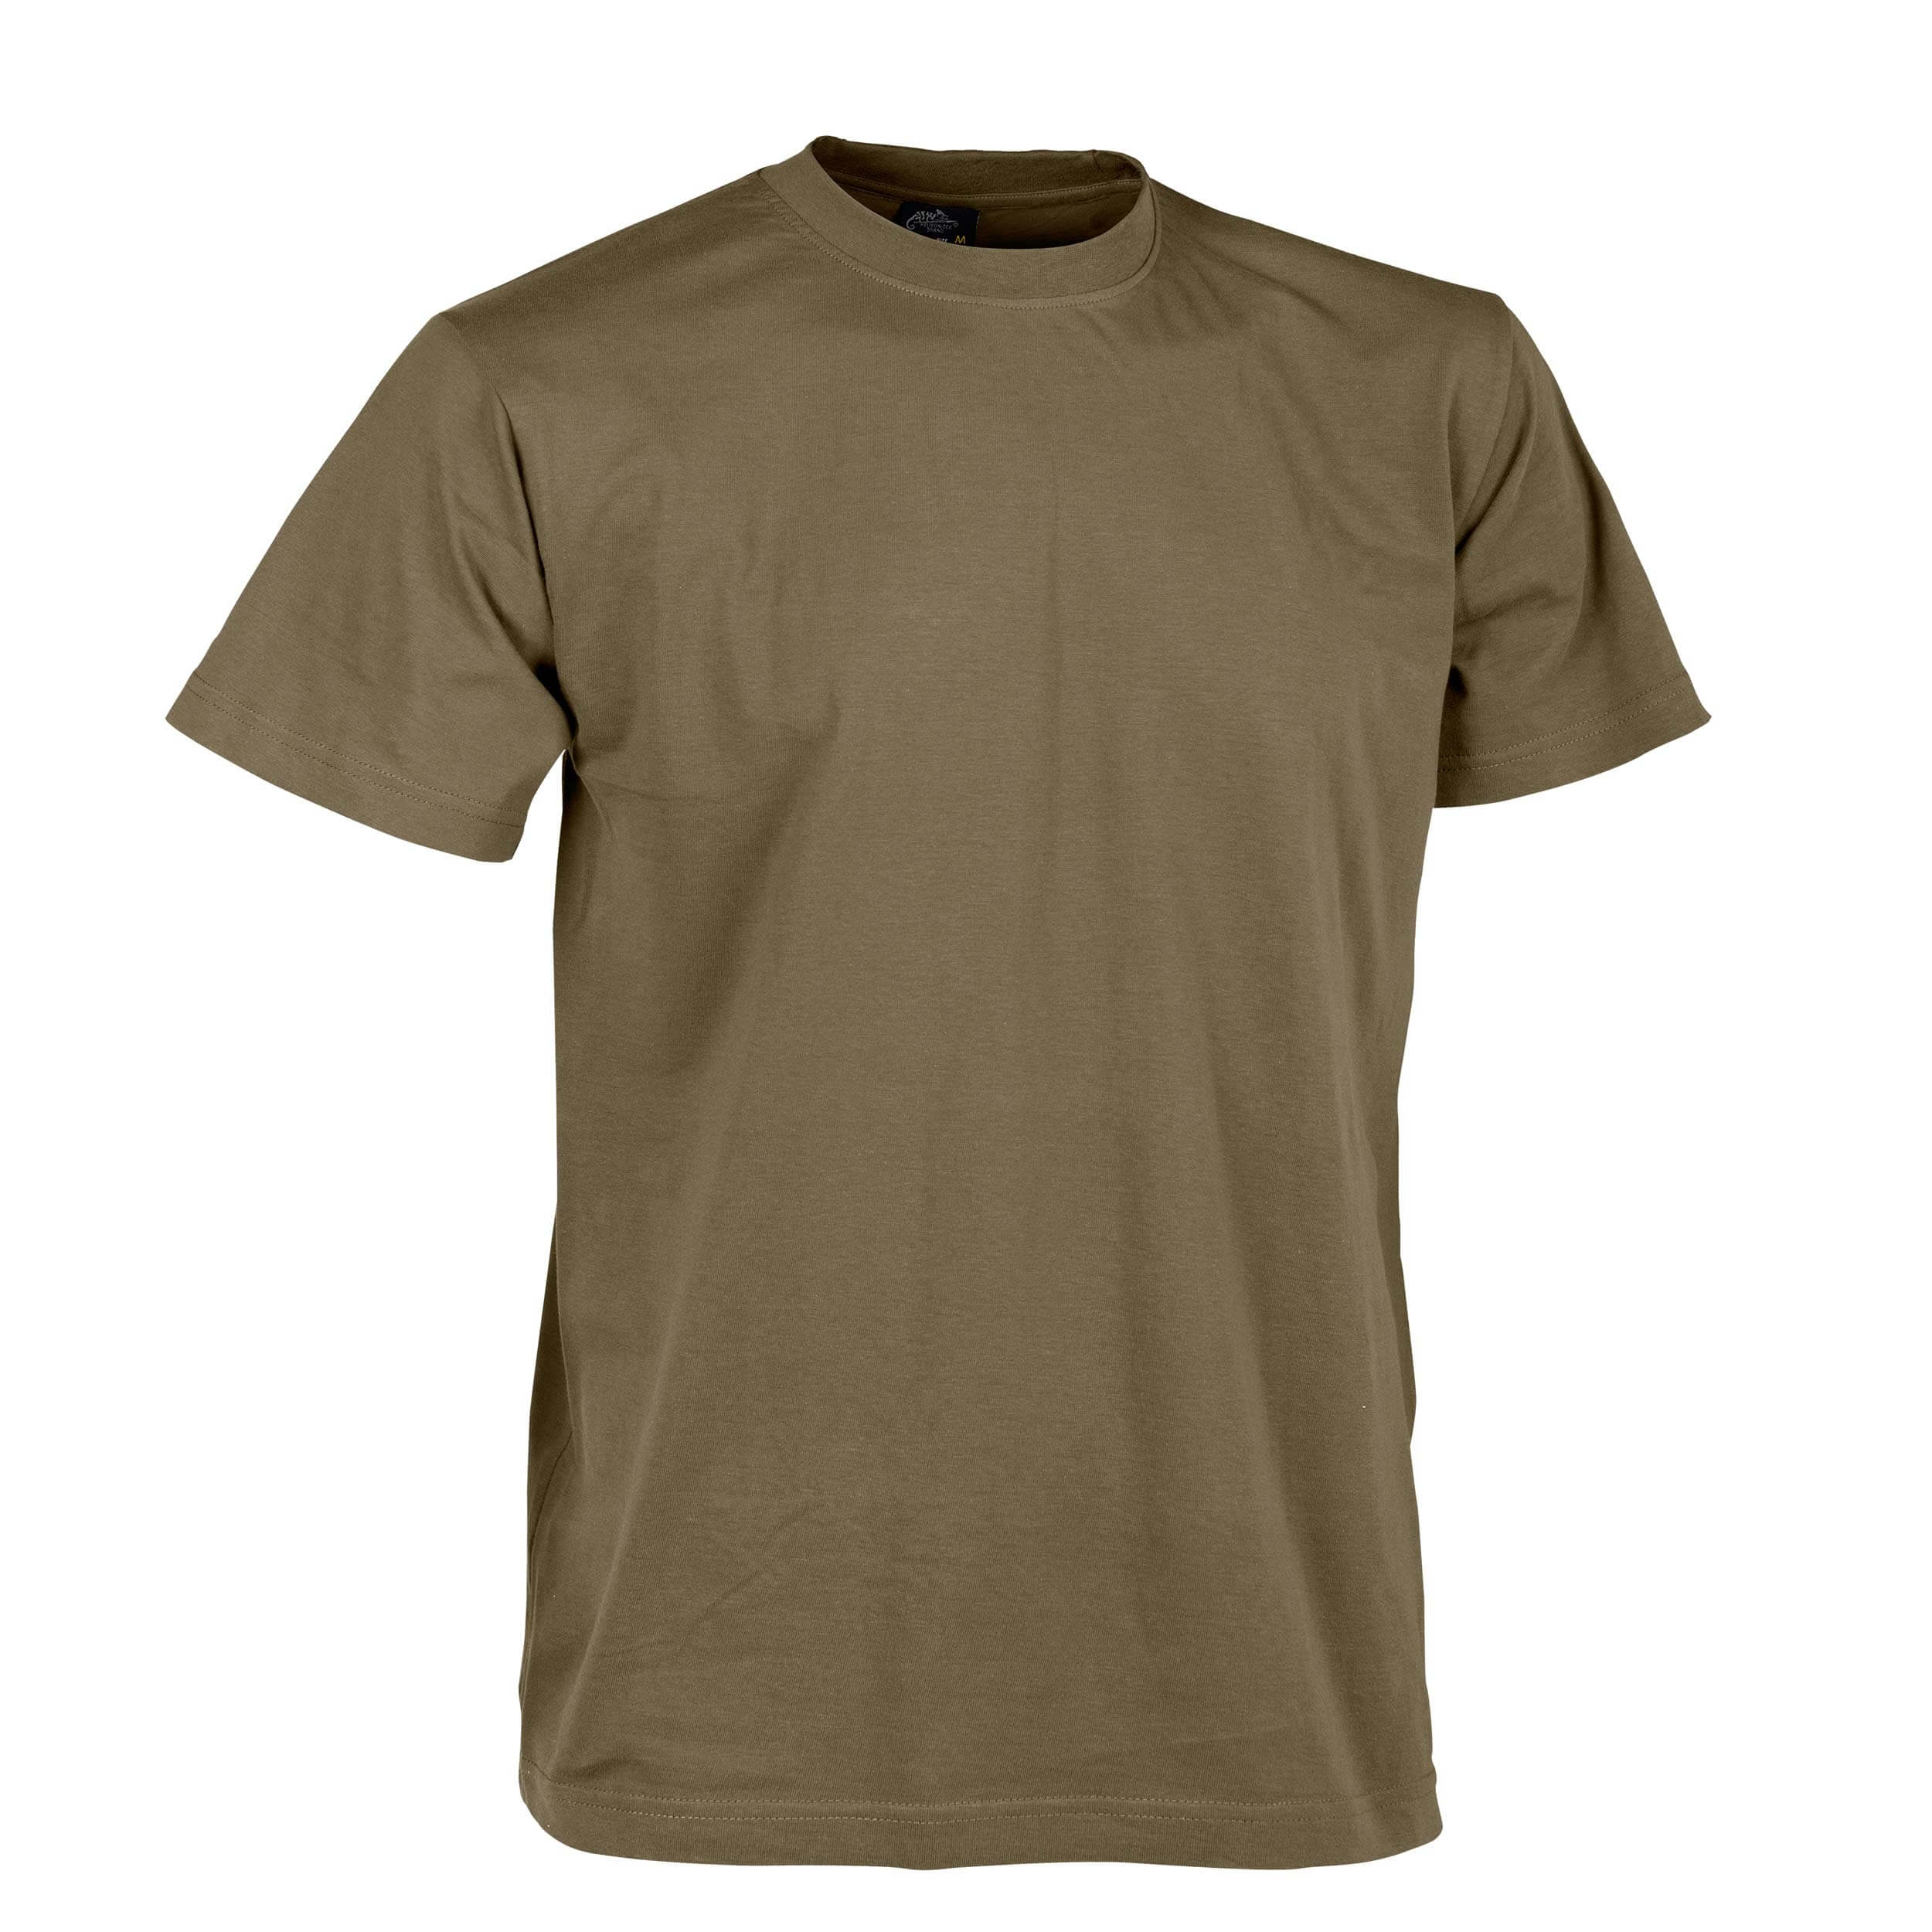 Helikon-Tex Classic Army T-Shirt Coyote